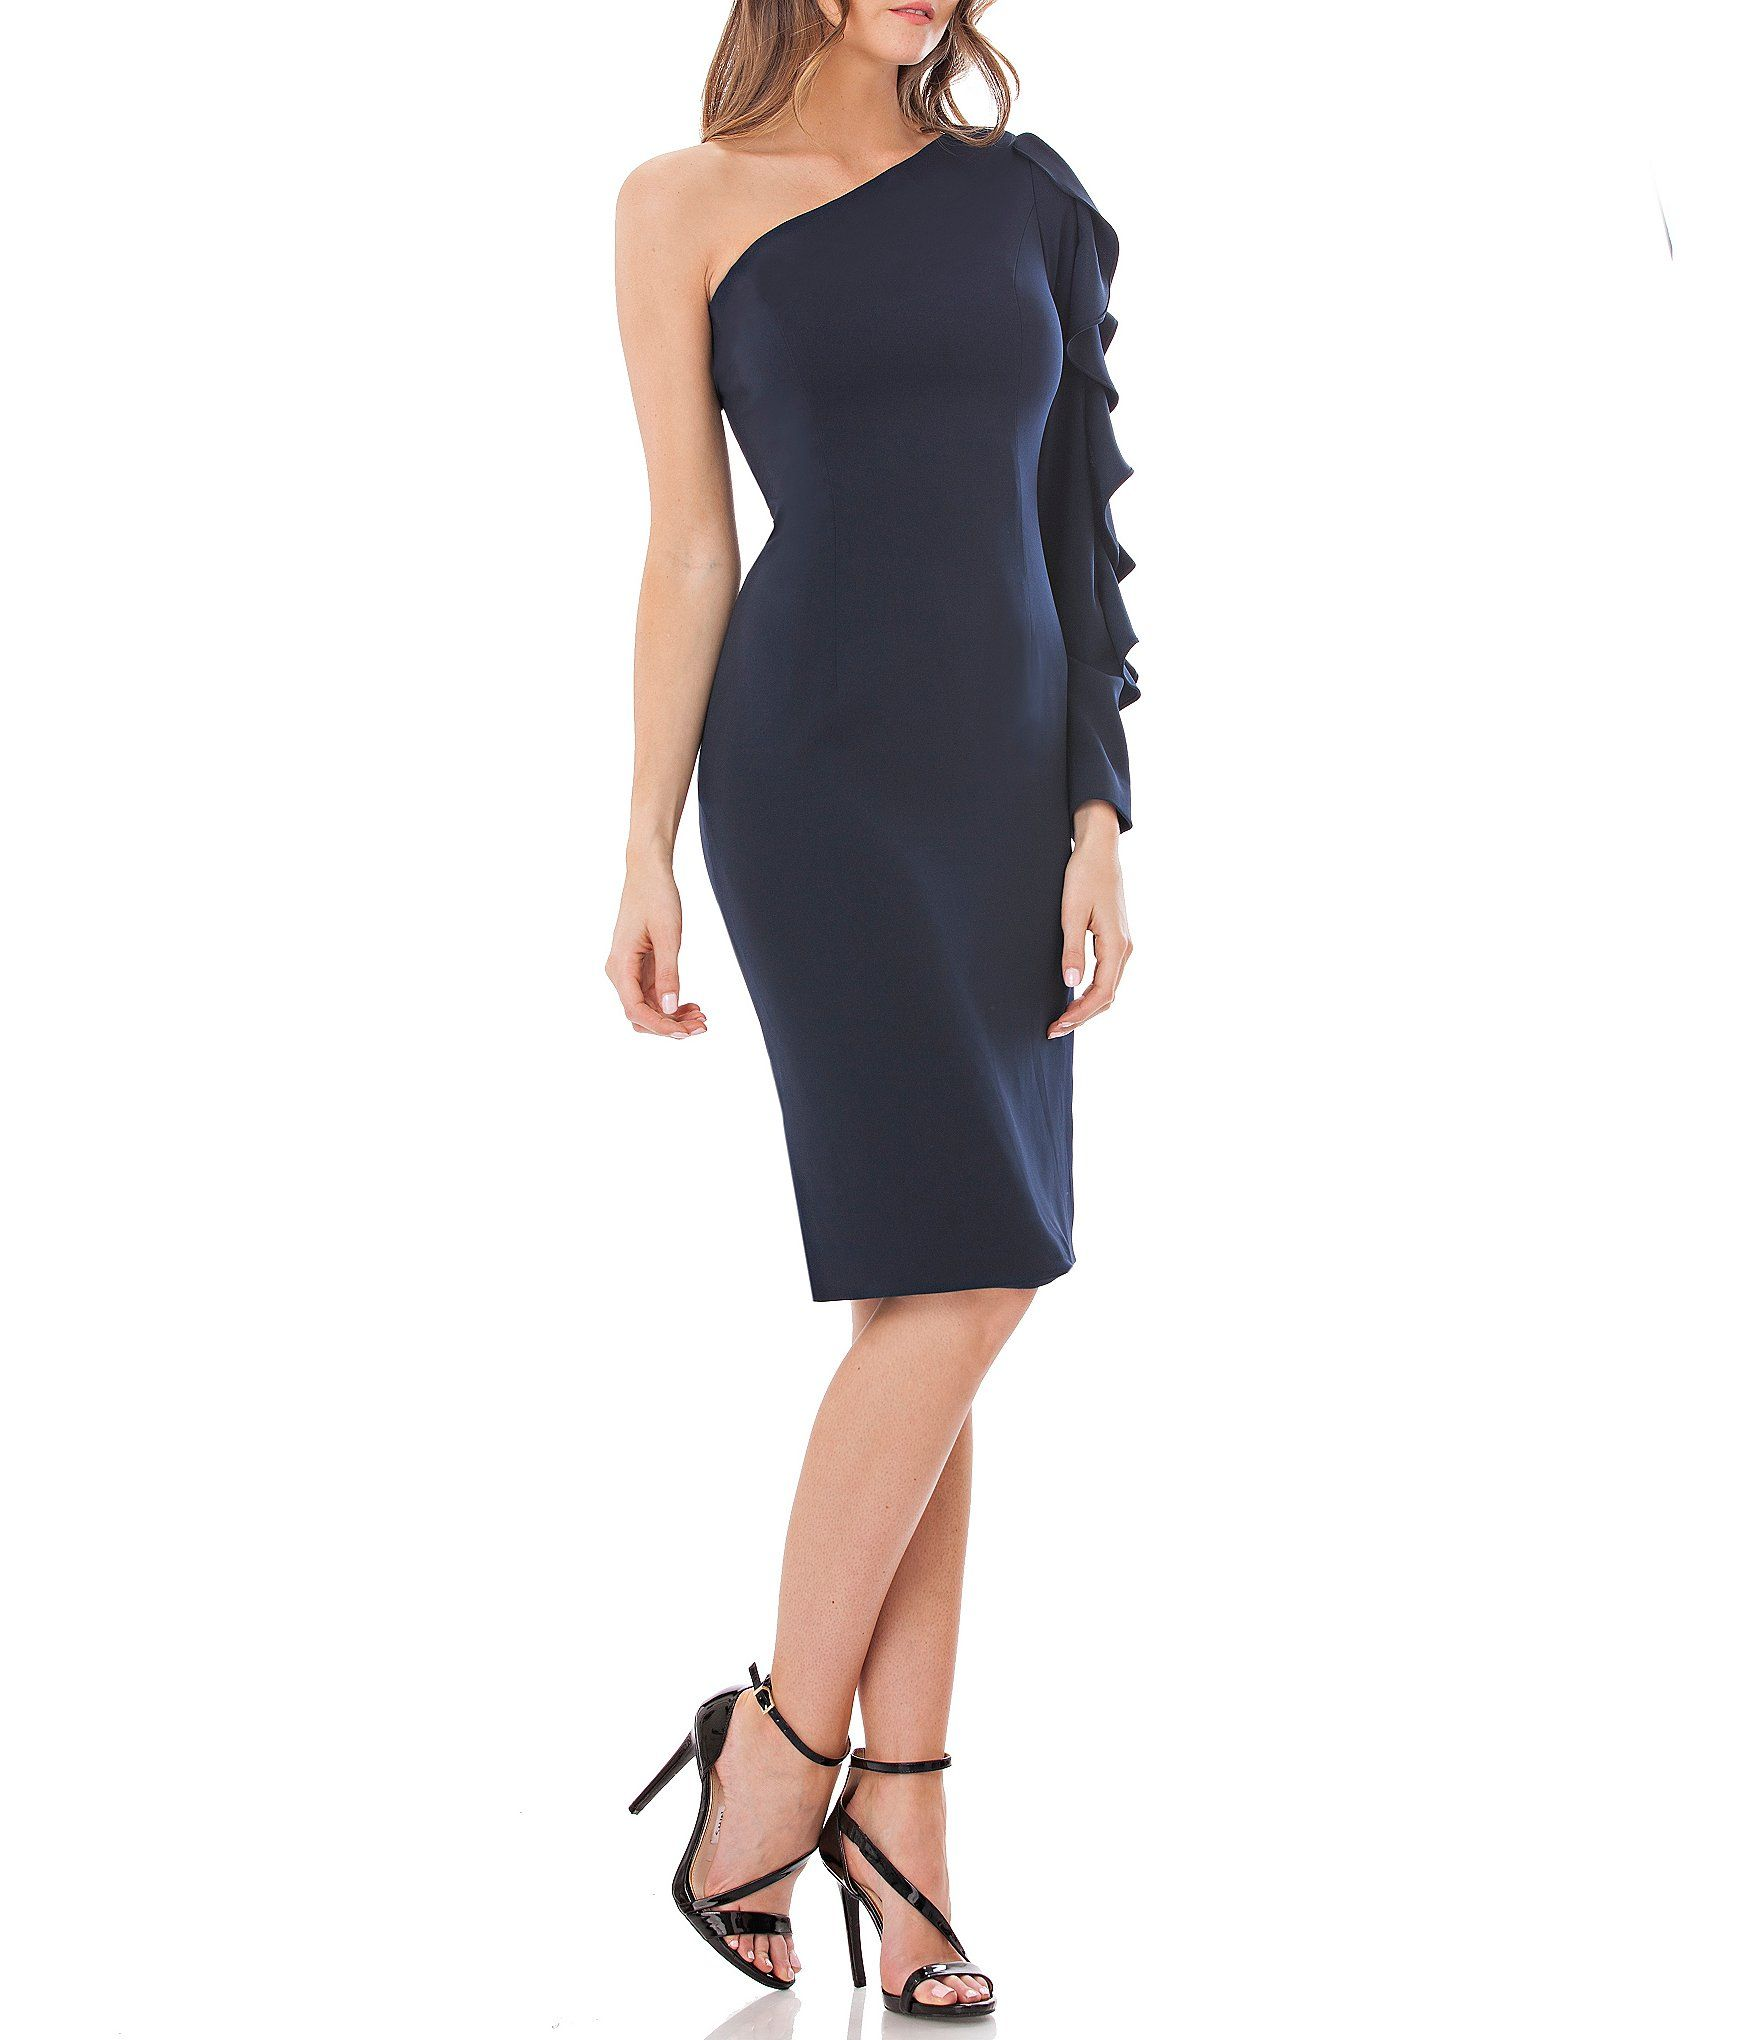 04c7e6551dd Shop for Carmen Marc Valvo Infusion Ruffle Sleeve One-Shoulder Dress at  Dillards.com. Visit Dillards.com to find clothing